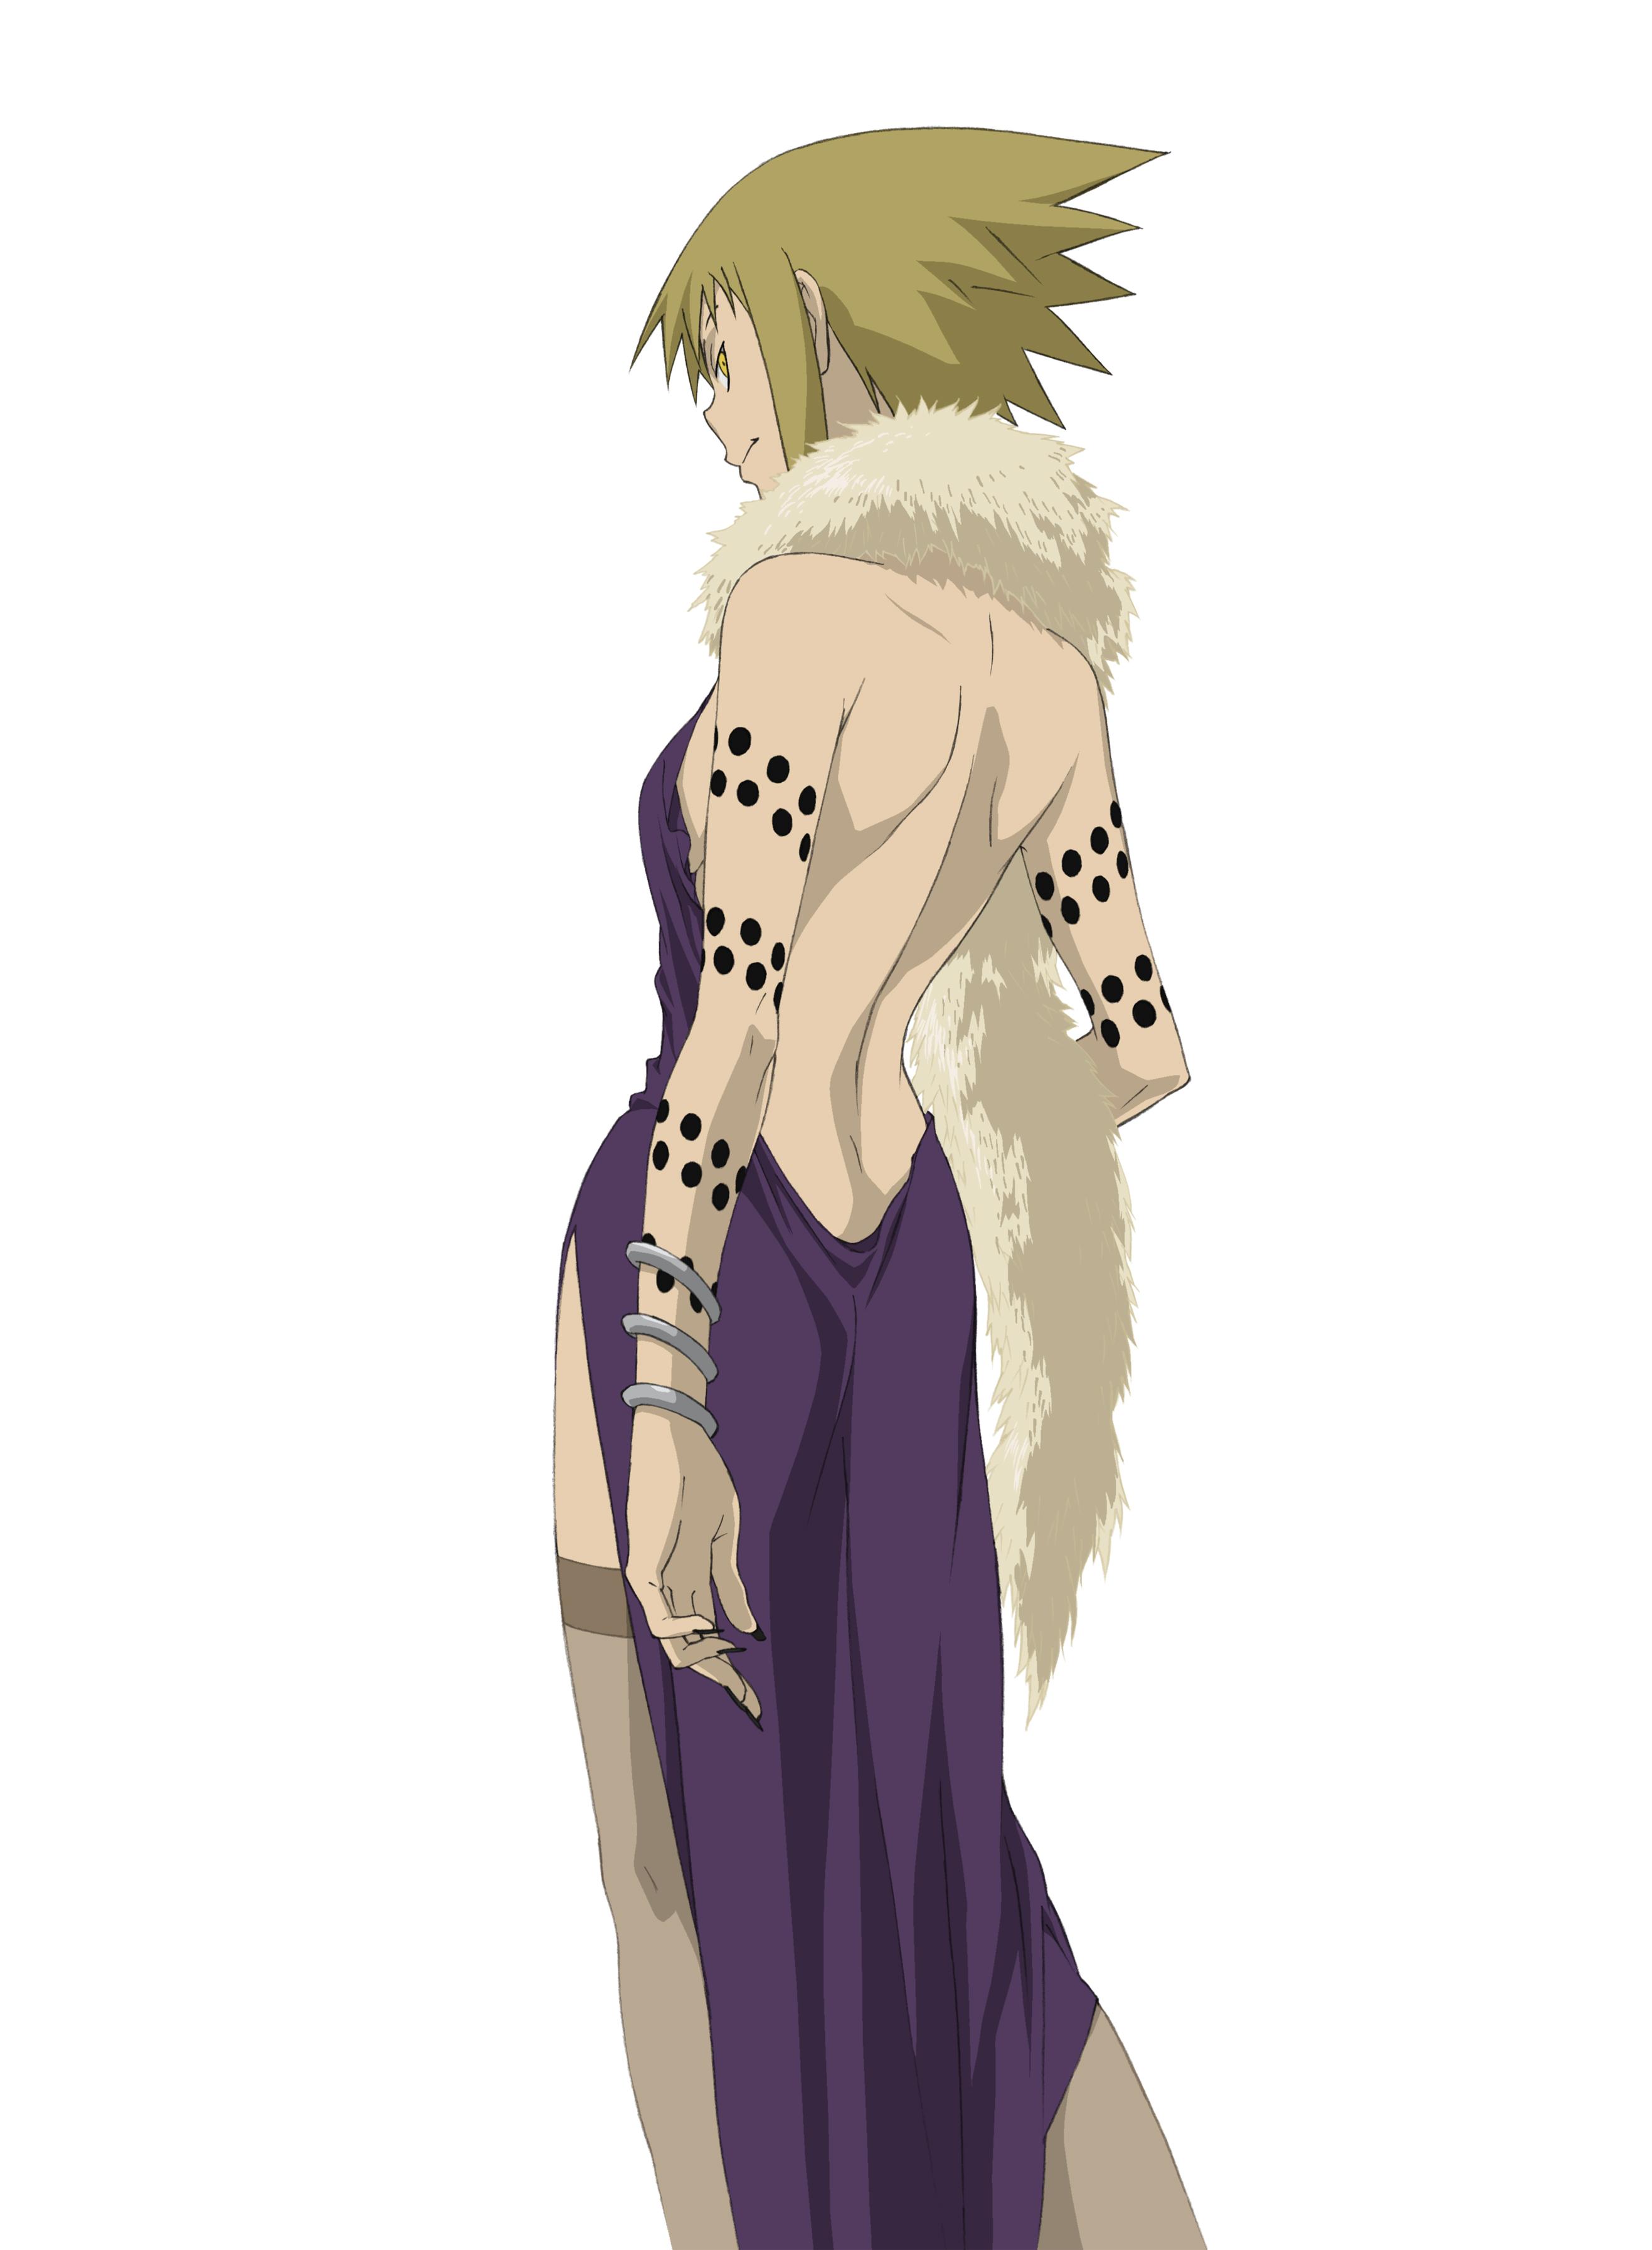 Soul Eater Evans Image #164500 - Zerochan Anime Image Board